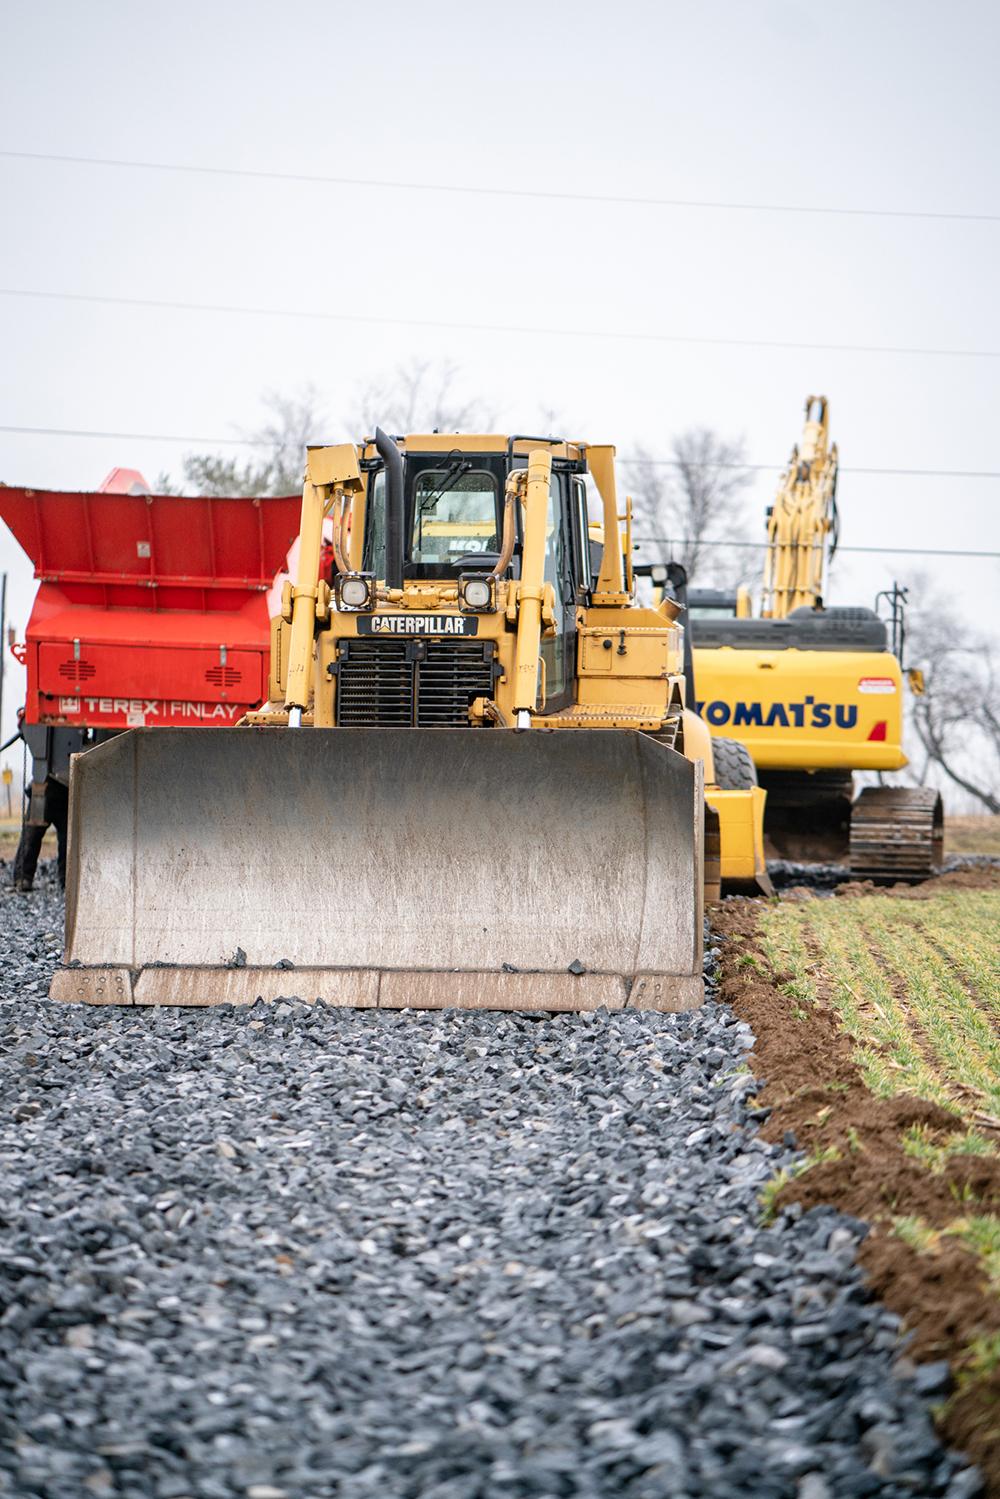 Caterpillar Bulldozer, Komatsu Excavator and Dump Truck Parked on a Gravel Path